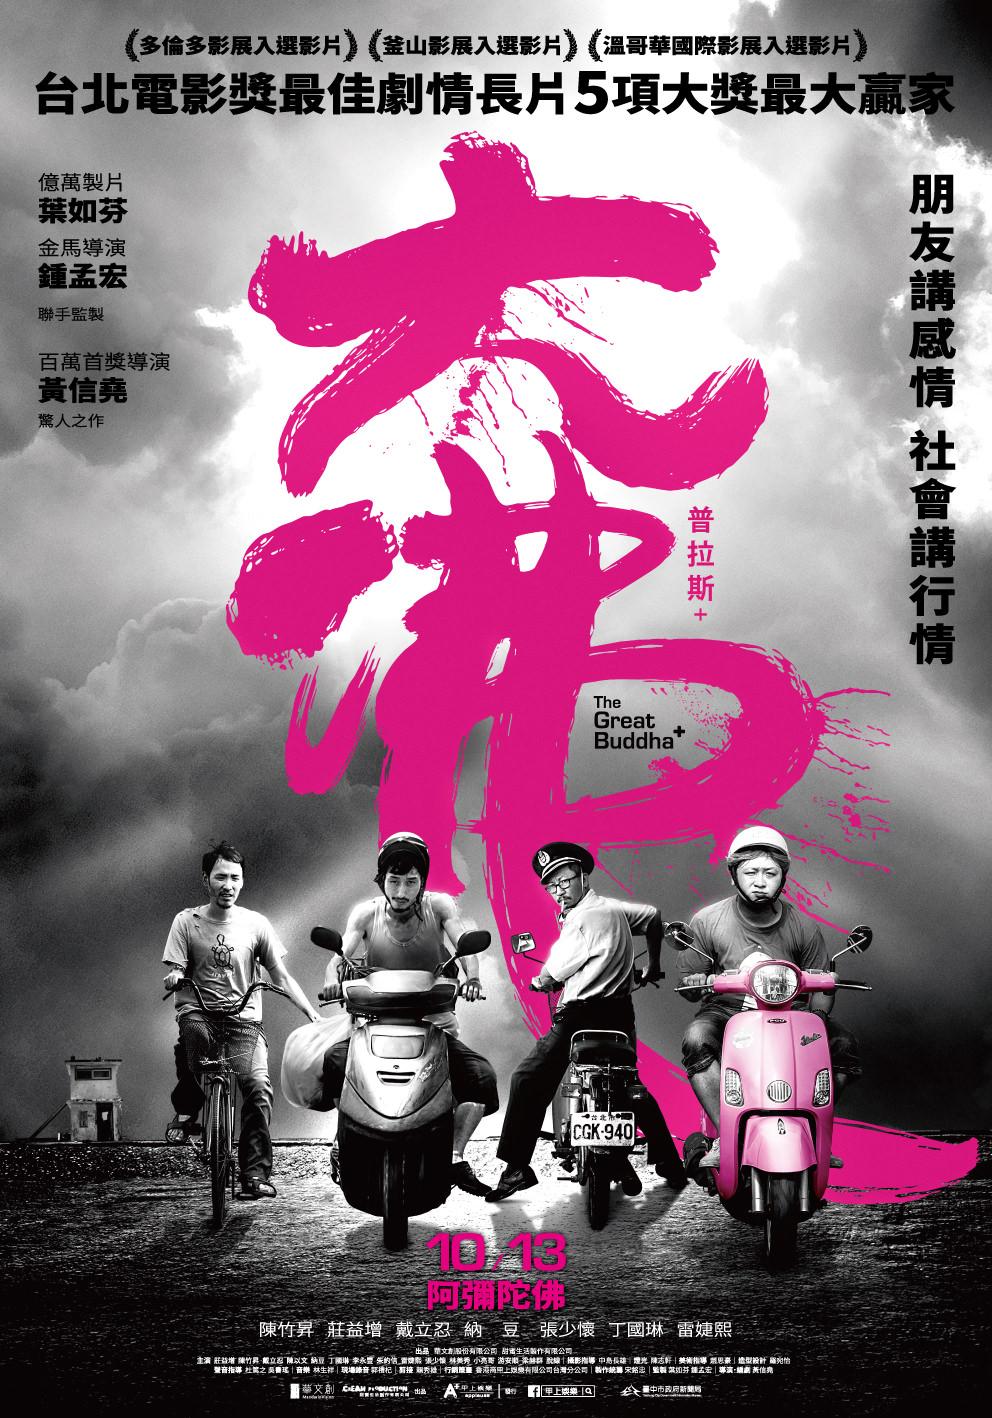 Movie, 大佛普拉斯(台灣, 2017年) / The Great Buddha+(英文), 電影海報, 台灣